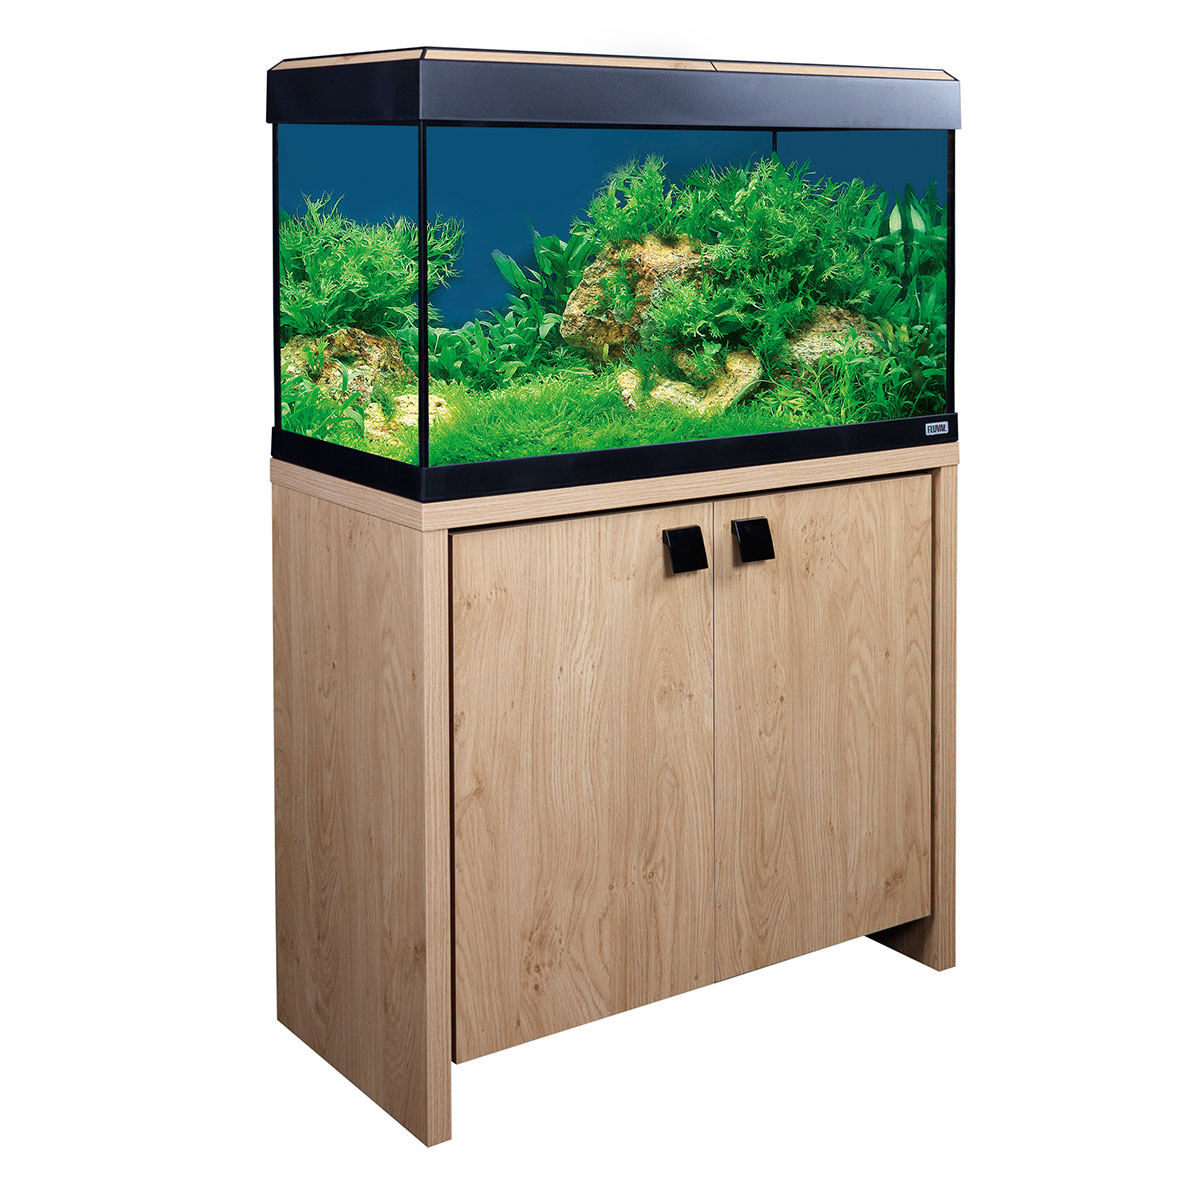 Fluval Aquarium Roma 125 Kombination günstig kaufen bei ZooRoyal